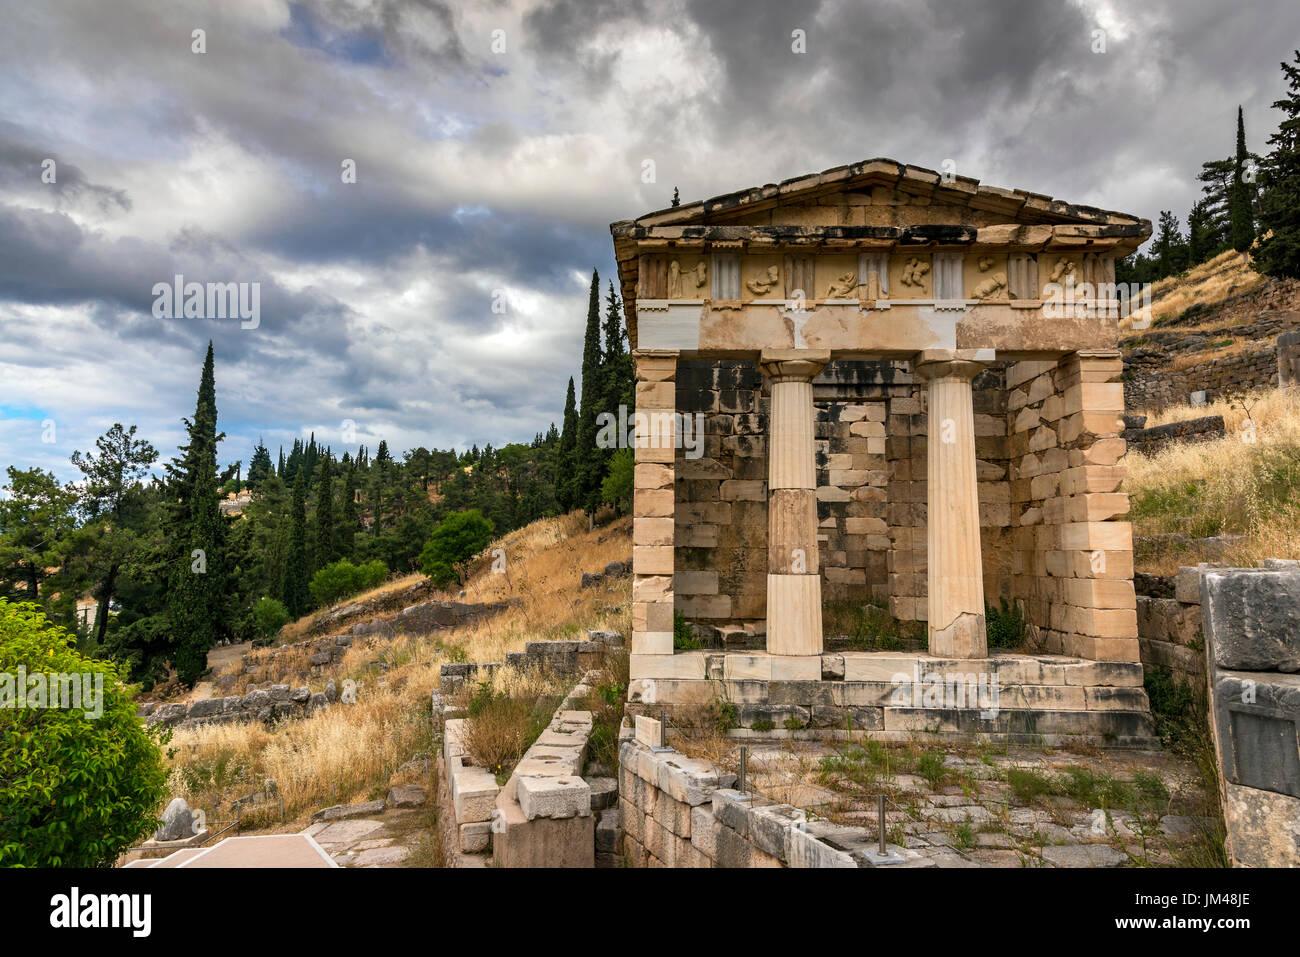 Athener Finanzministerium, Delphi, Zentral-Griechenland, Griechenland Stockbild